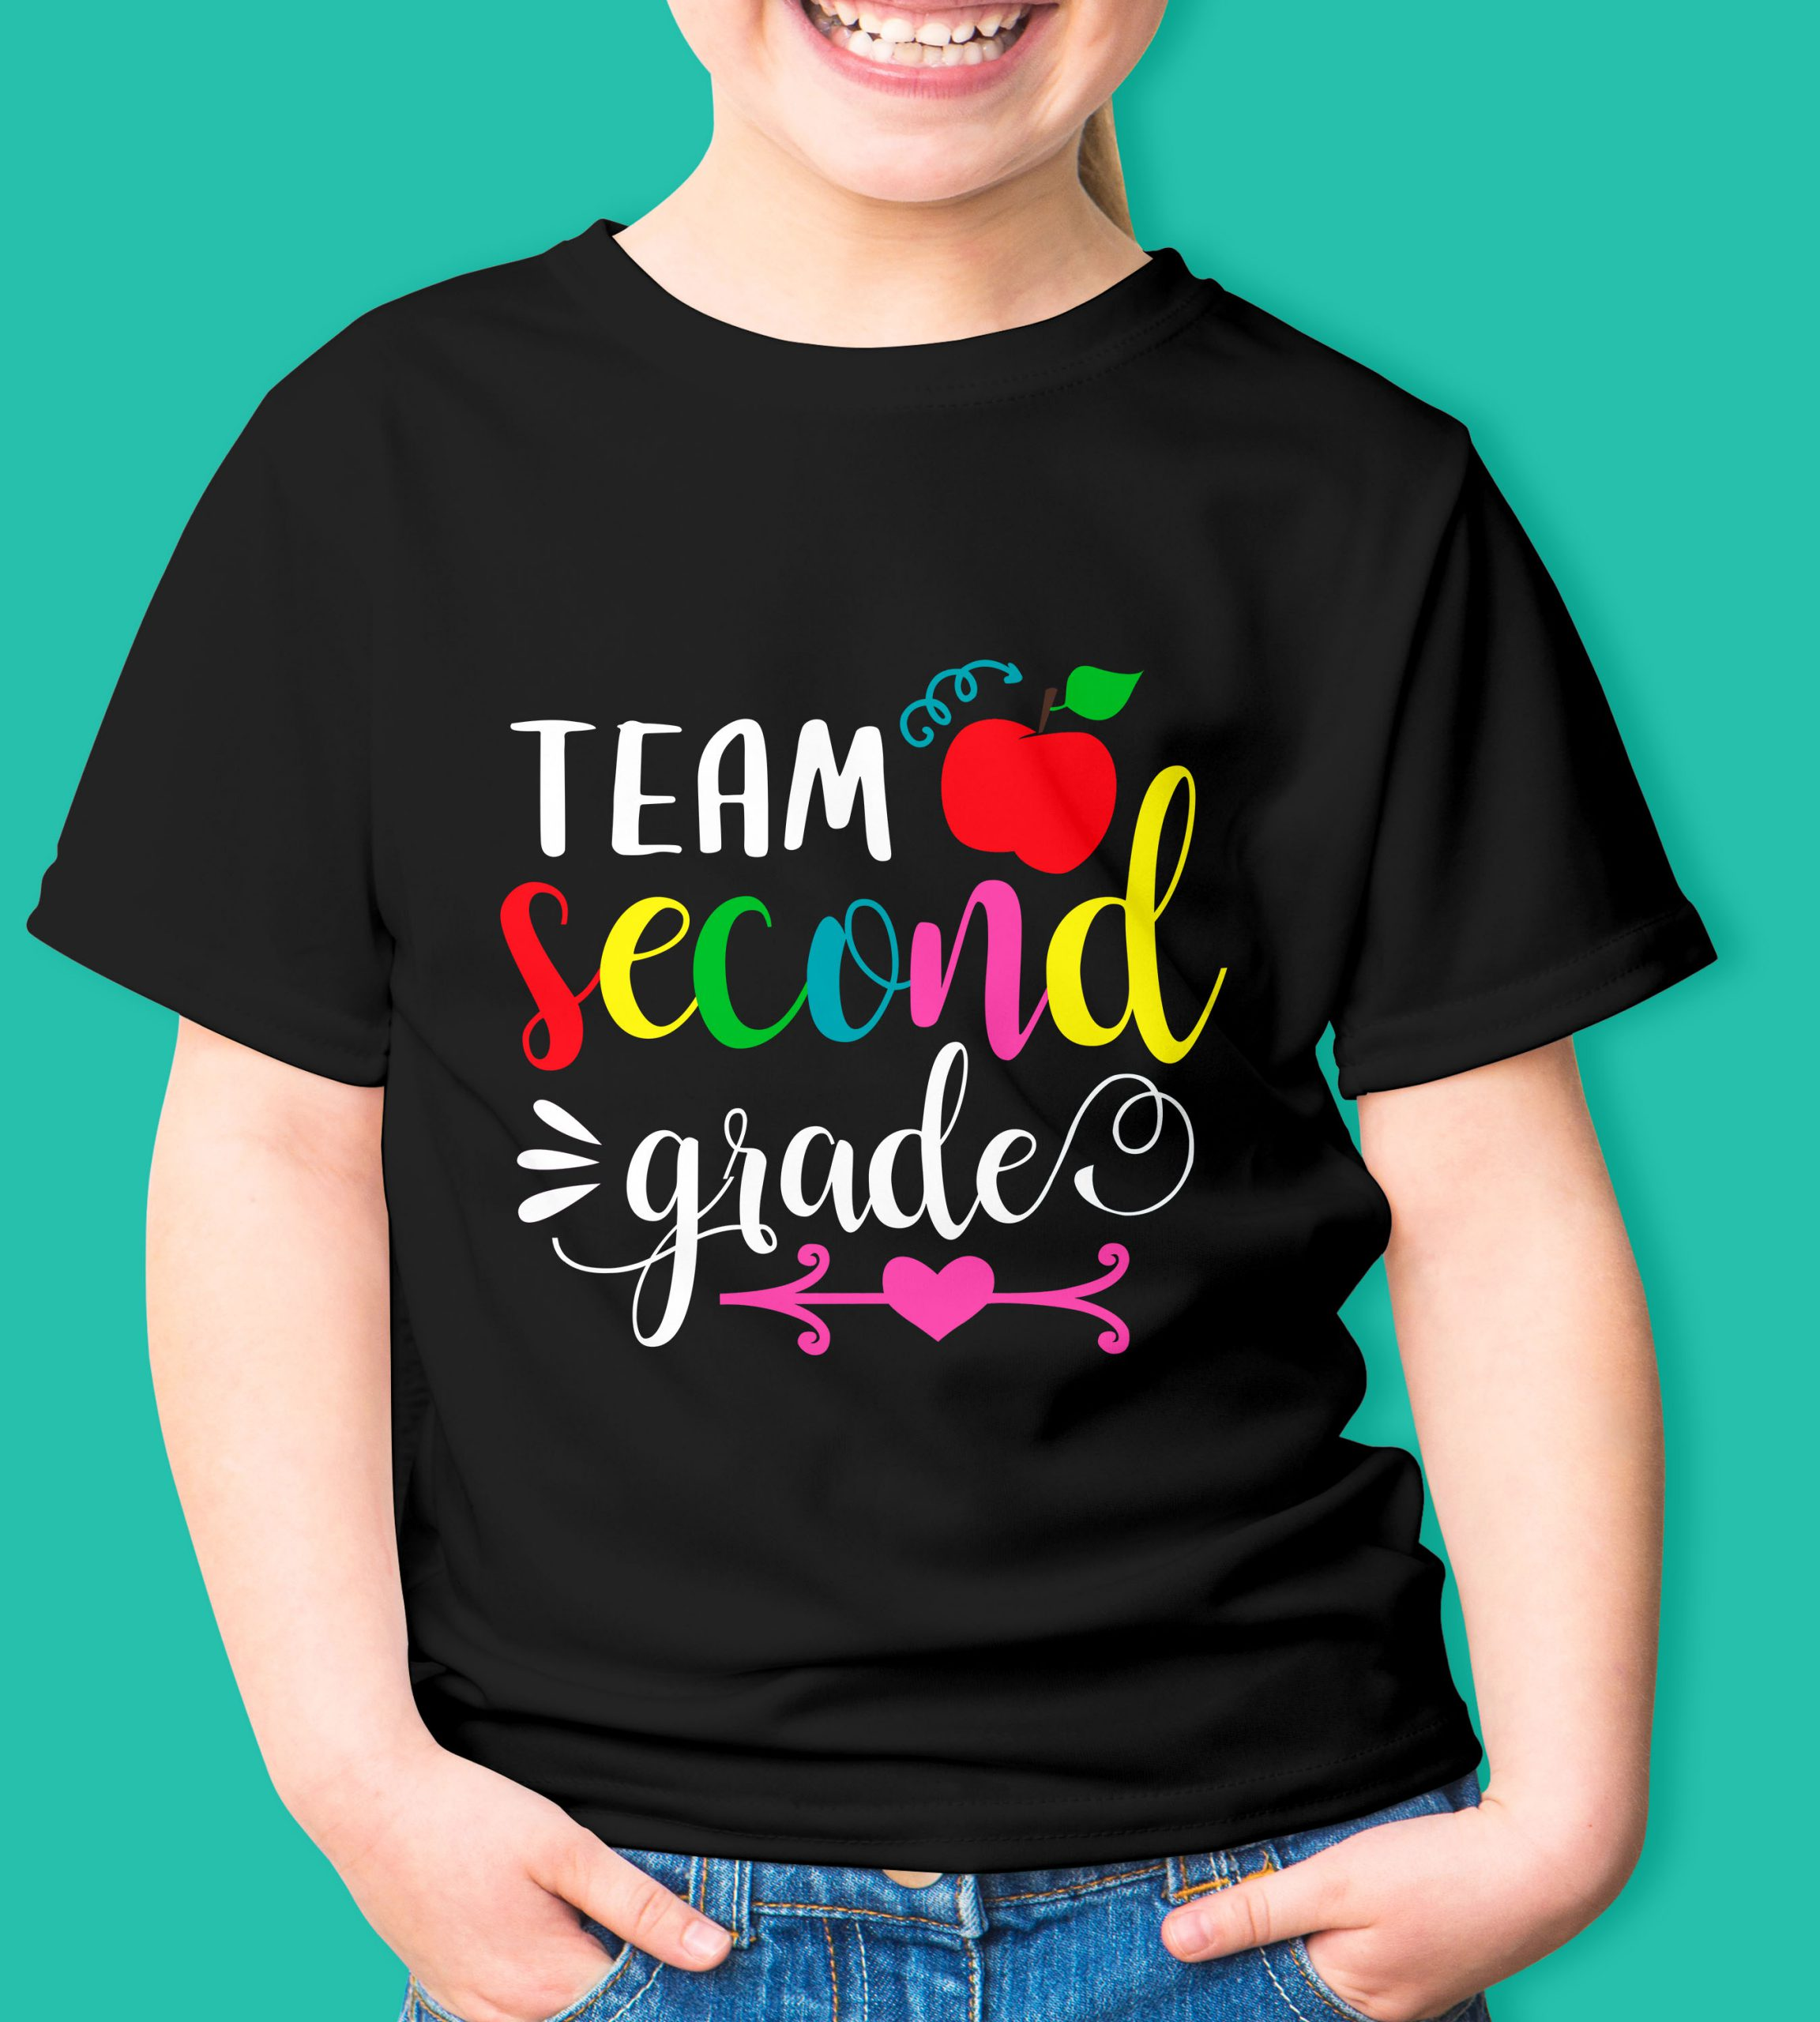 Team second grade